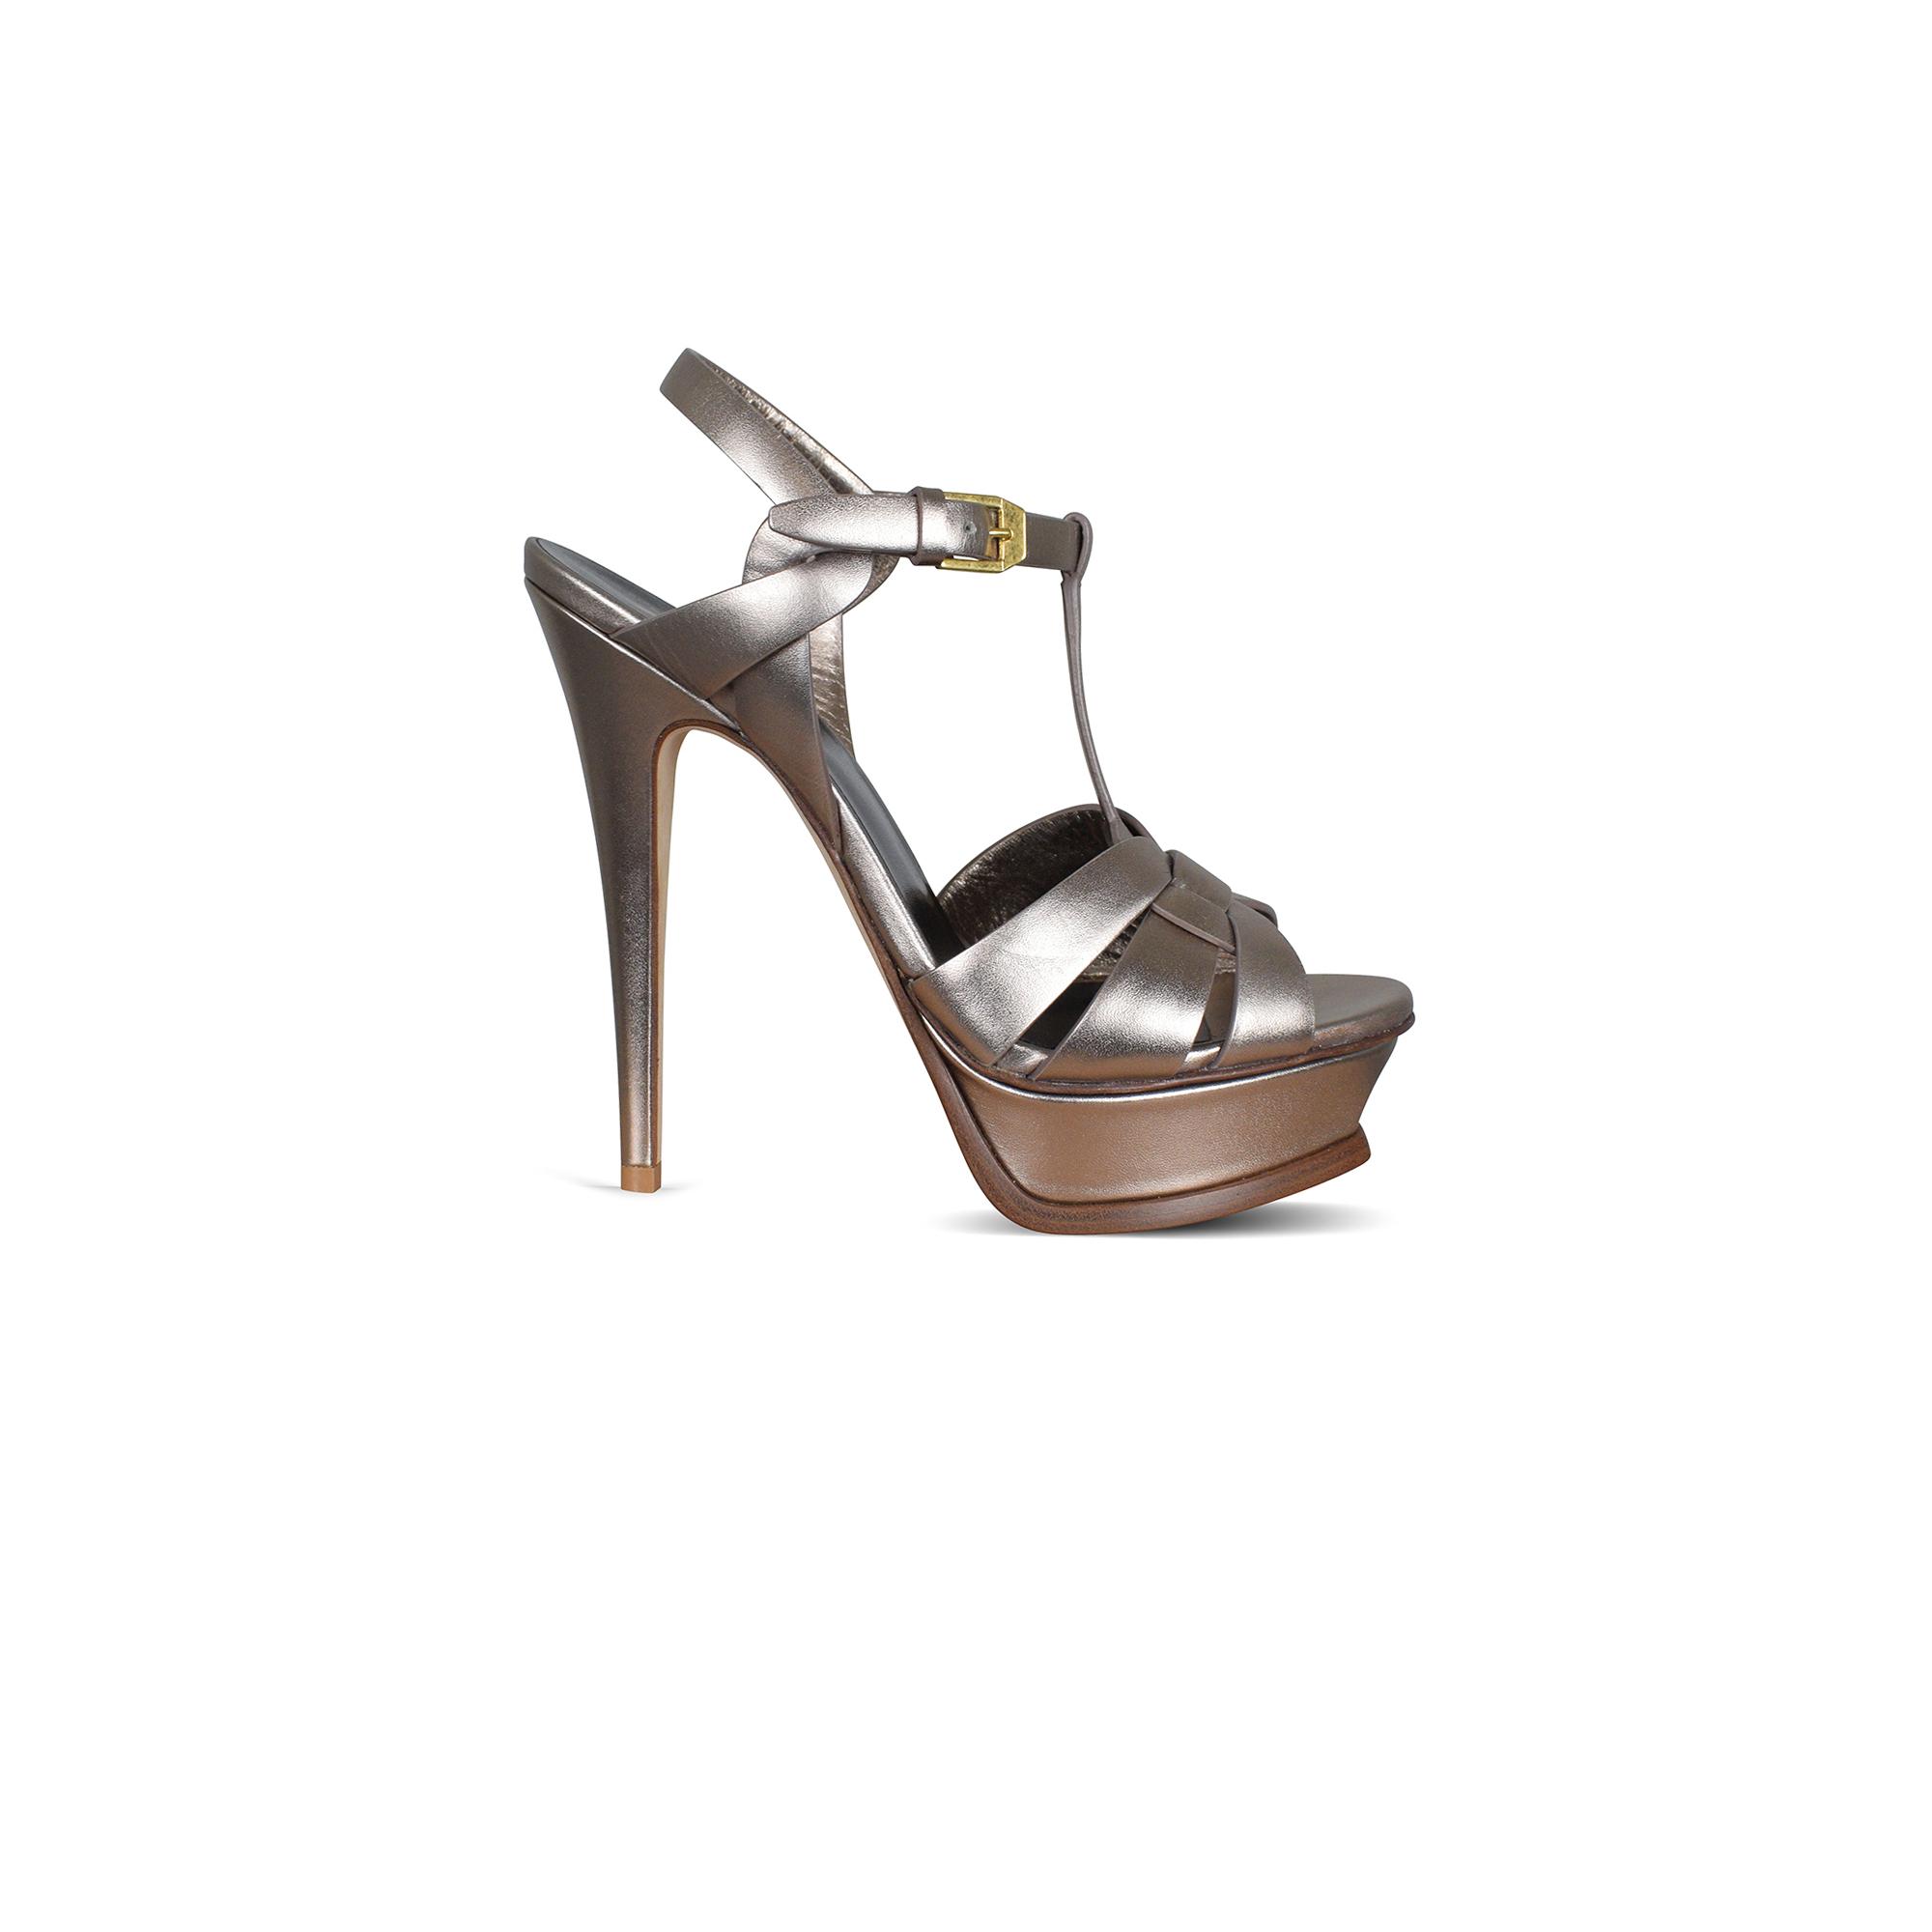 Tribute Saint Laurent sandals in copper-colored metallic leather.